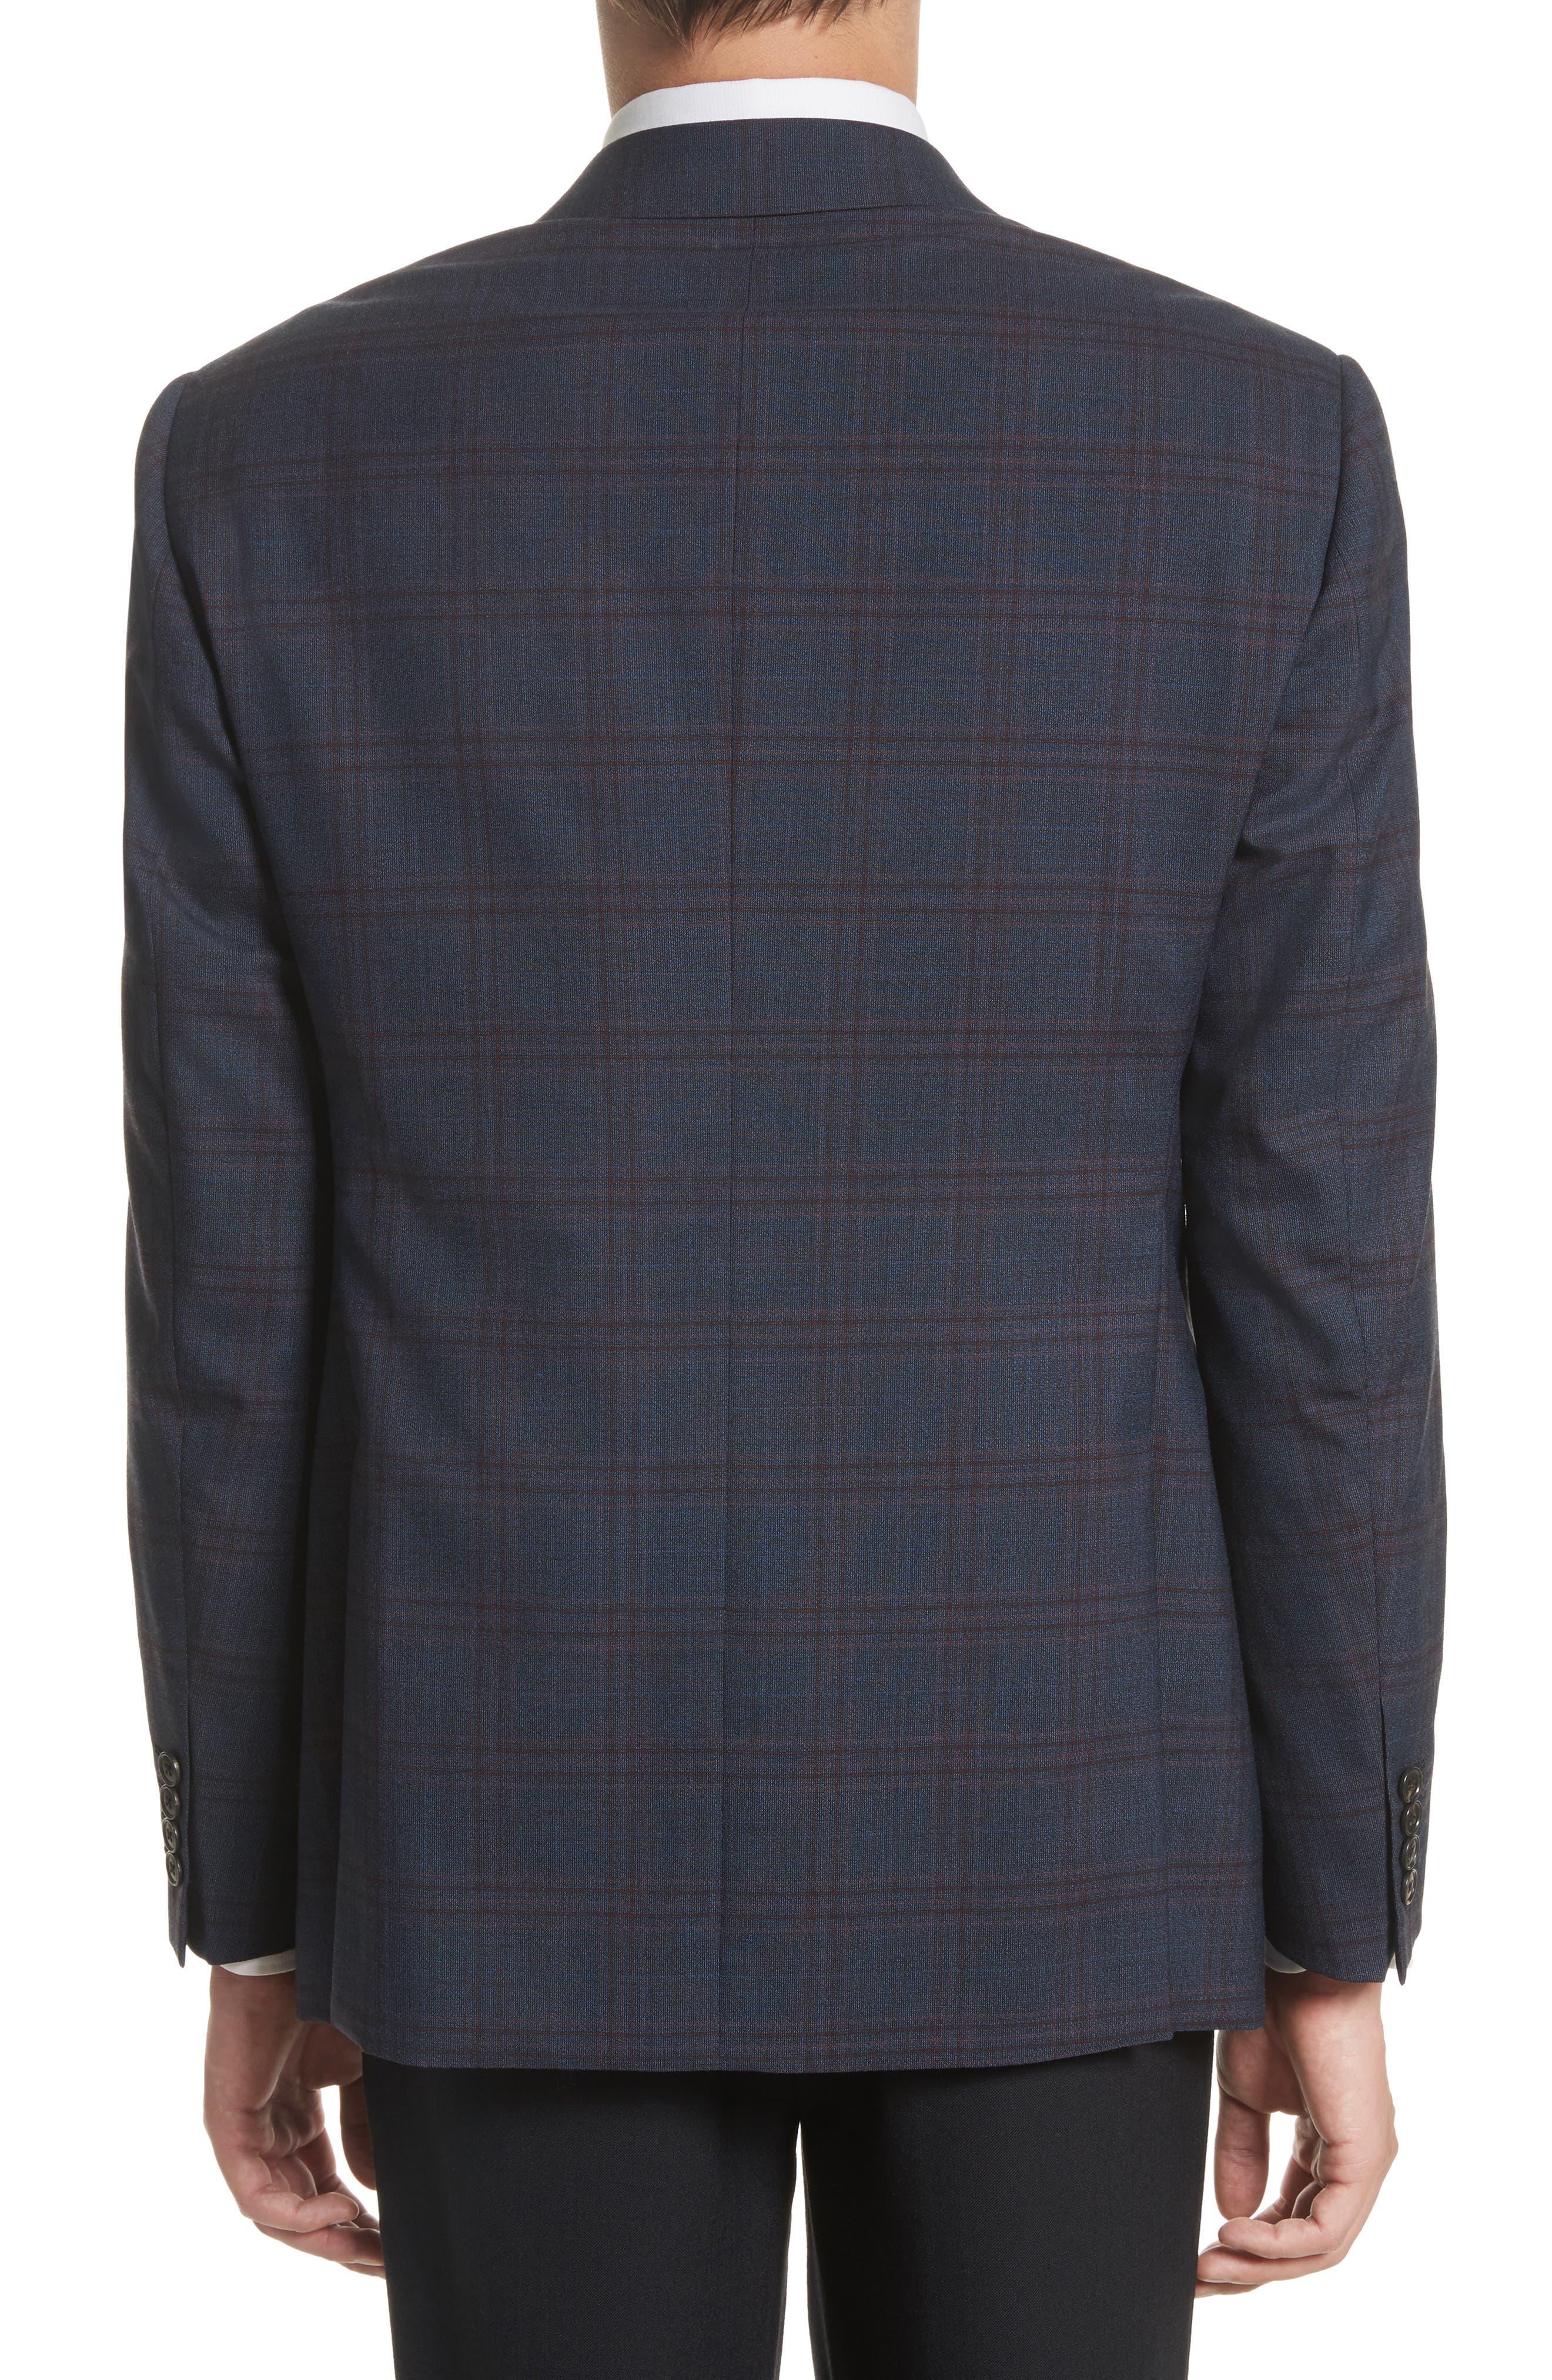 Alternate Image 2  - Armani Collezioni G-Line Trim Fit Plaid Wool Sport Coat